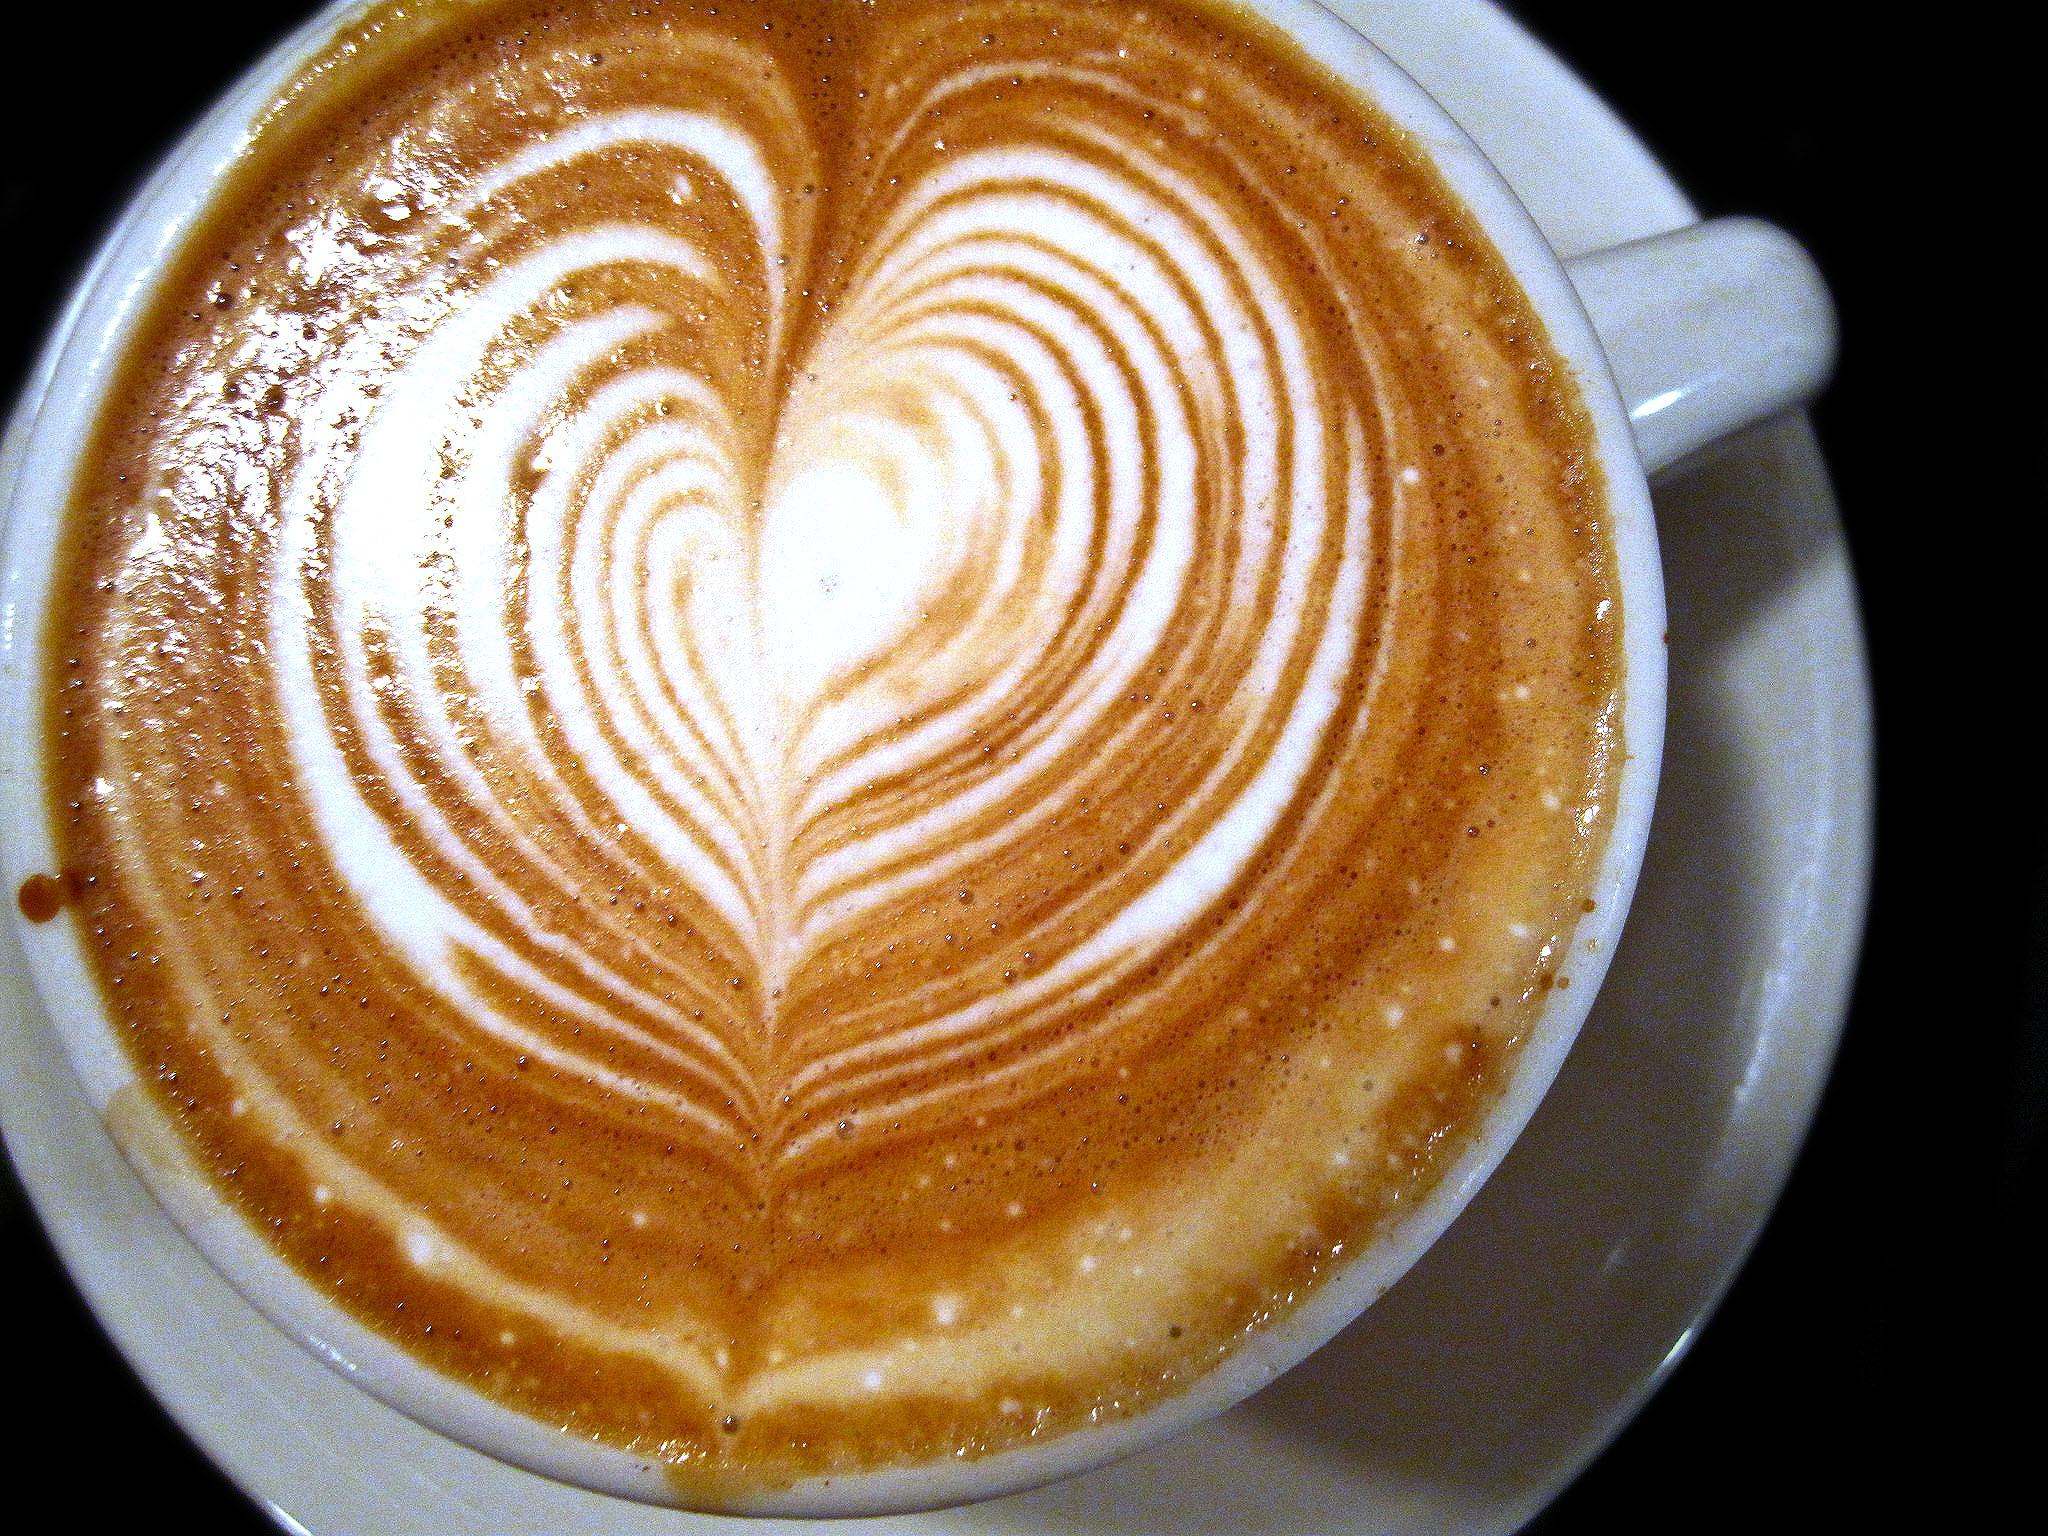 Ninth Street Espresso - Cappuccino